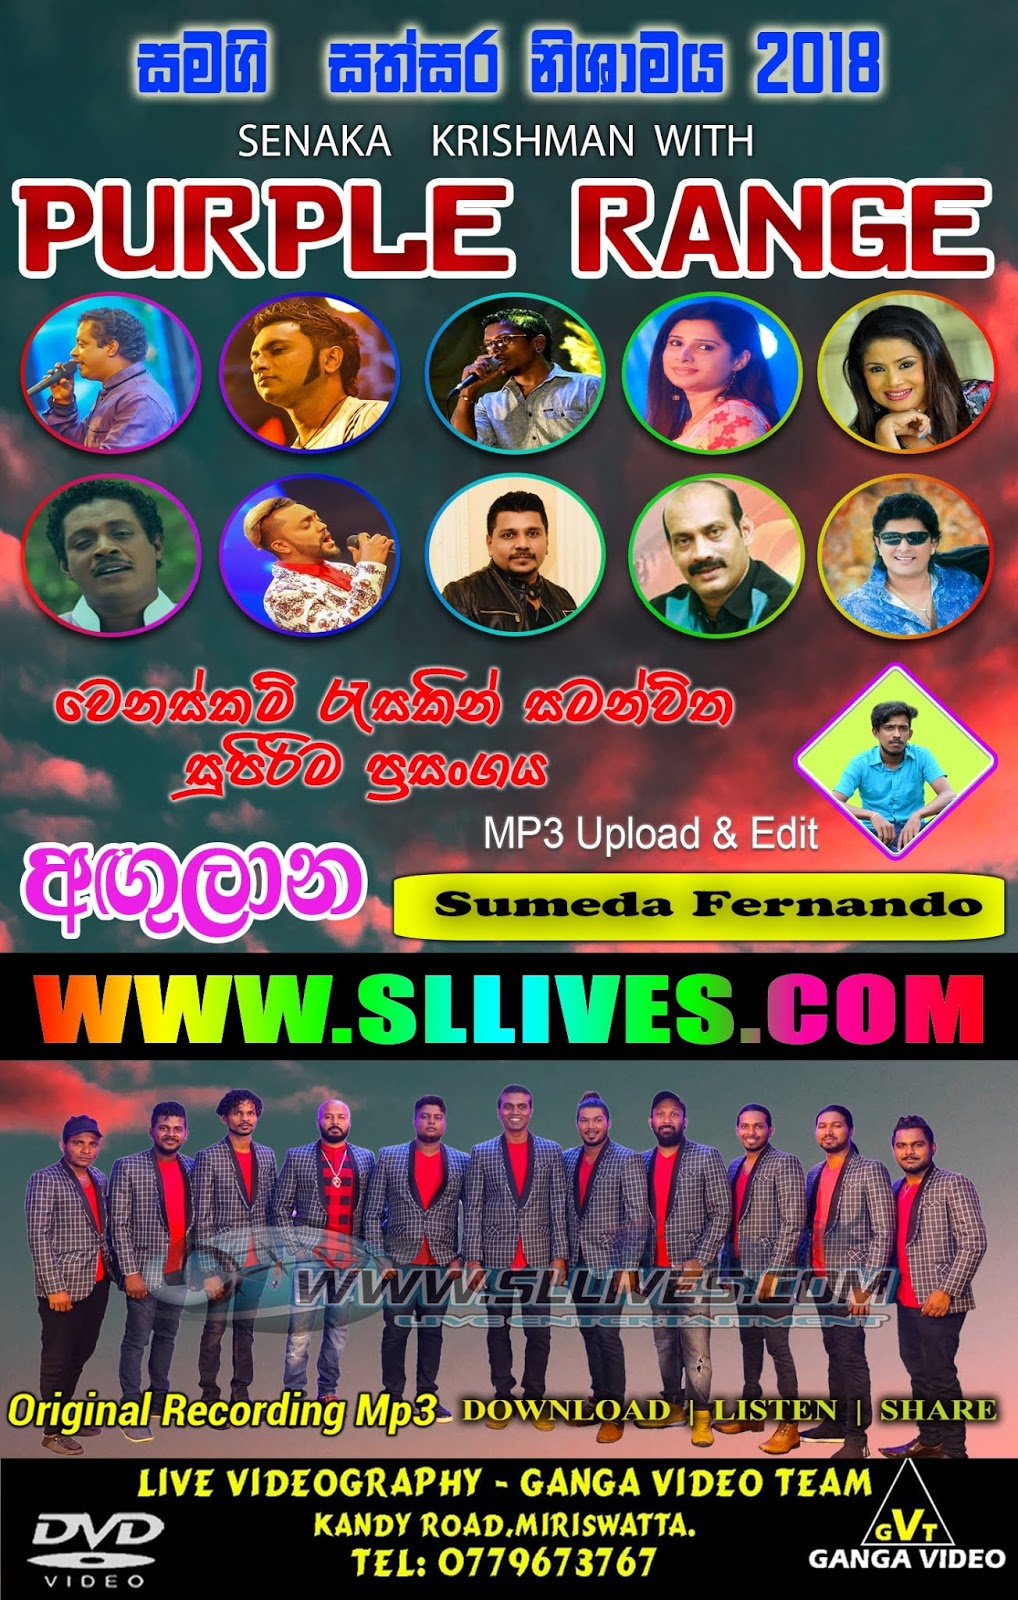 Purple Range Band Mp3 Songs Download - ▷ ▷ PowerMall